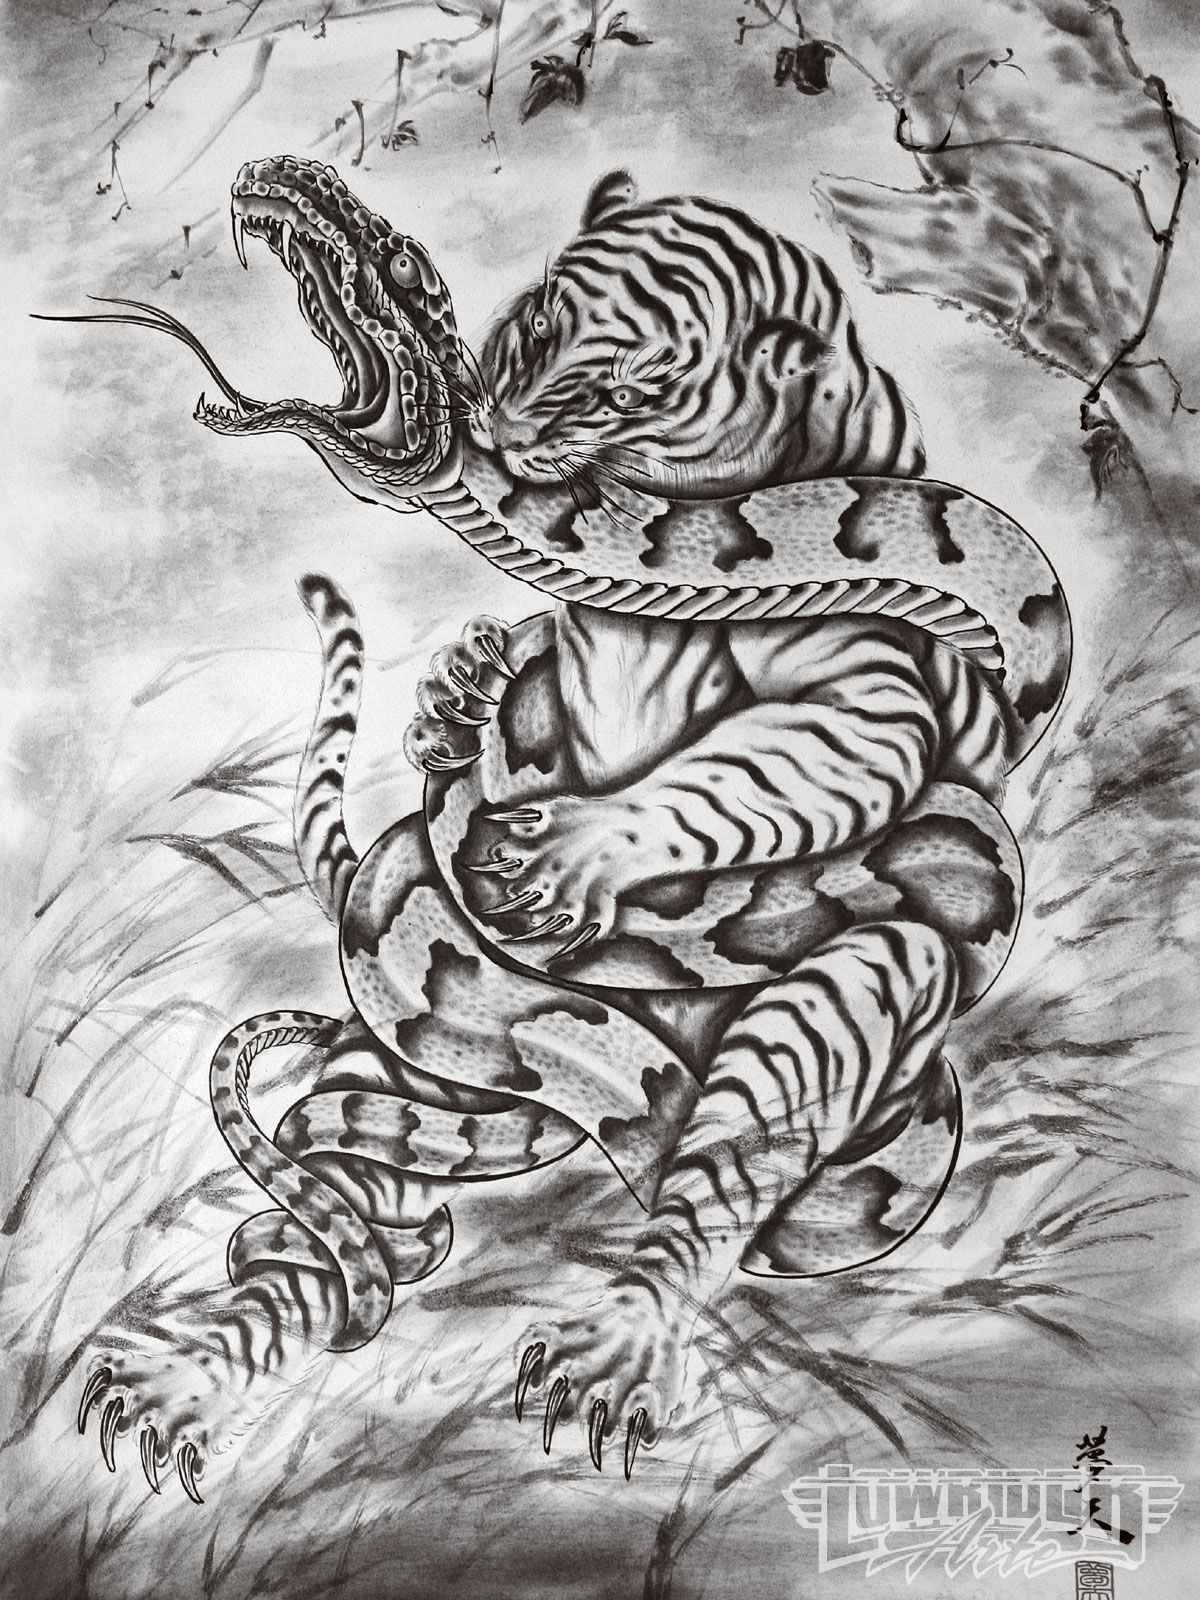 japanese art snake vs tiger tattoo artist horiyoshi iii tiger and snake photo 4 reptile. Black Bedroom Furniture Sets. Home Design Ideas